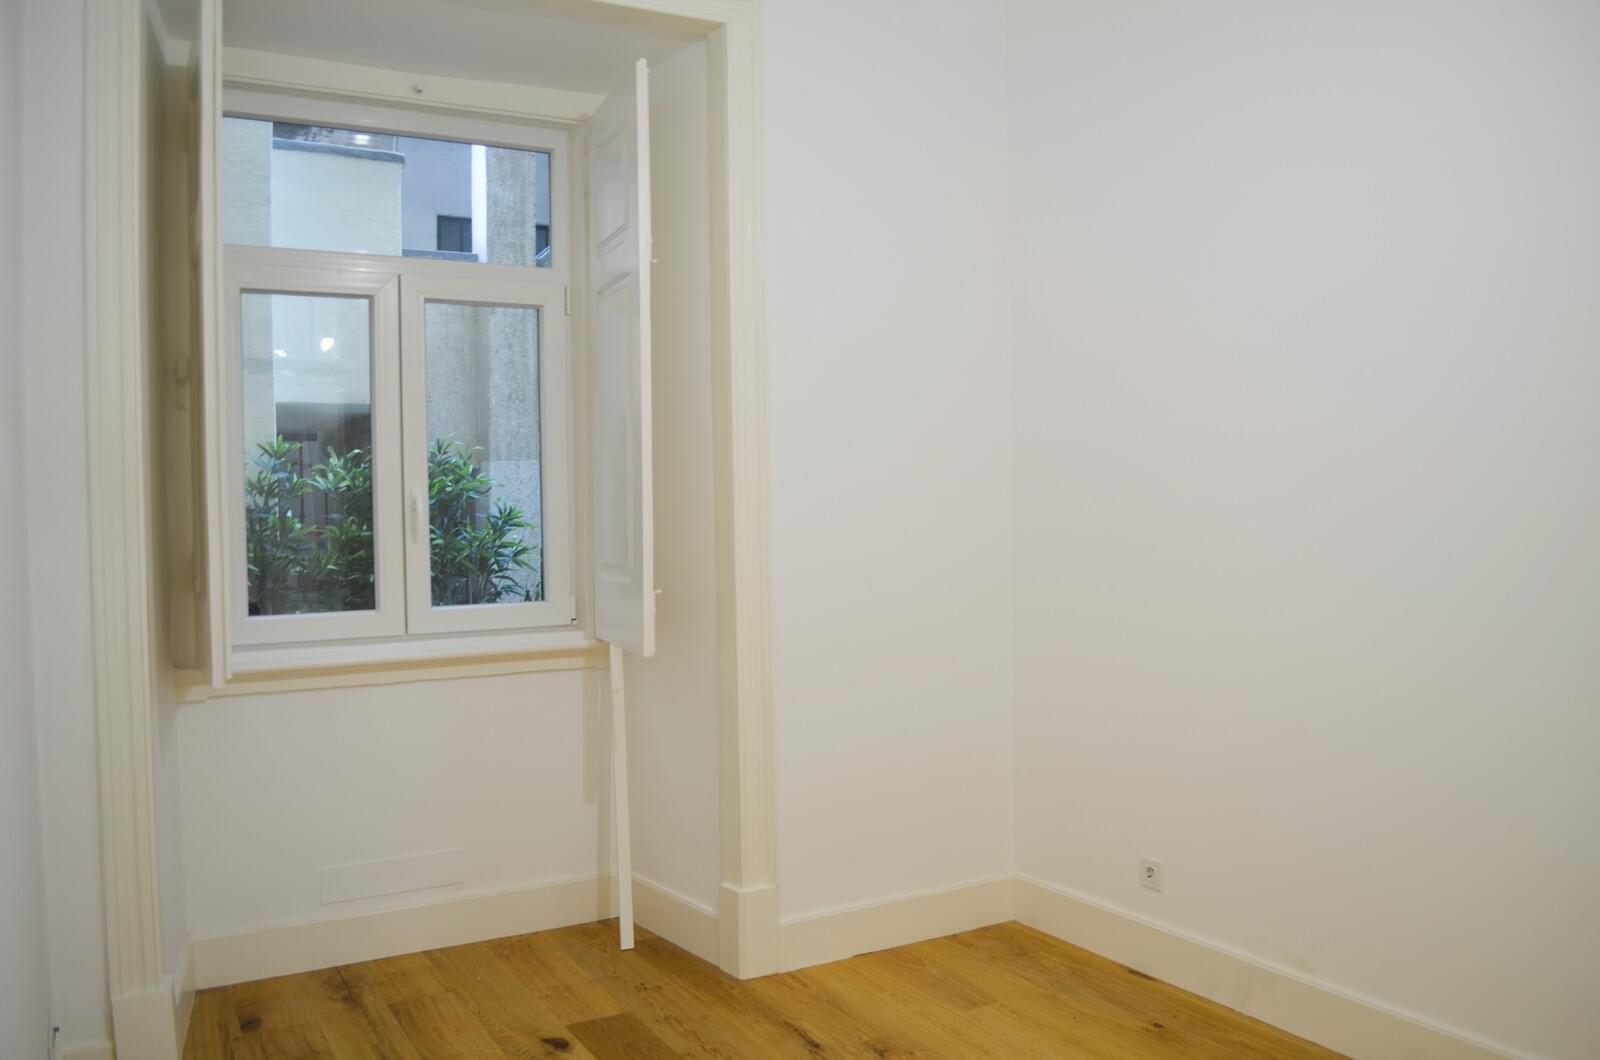 pf18801-apartamento-t2-lisboa-3957a9d0-b2a9-489e-af3a-3bf19ab4f7d4